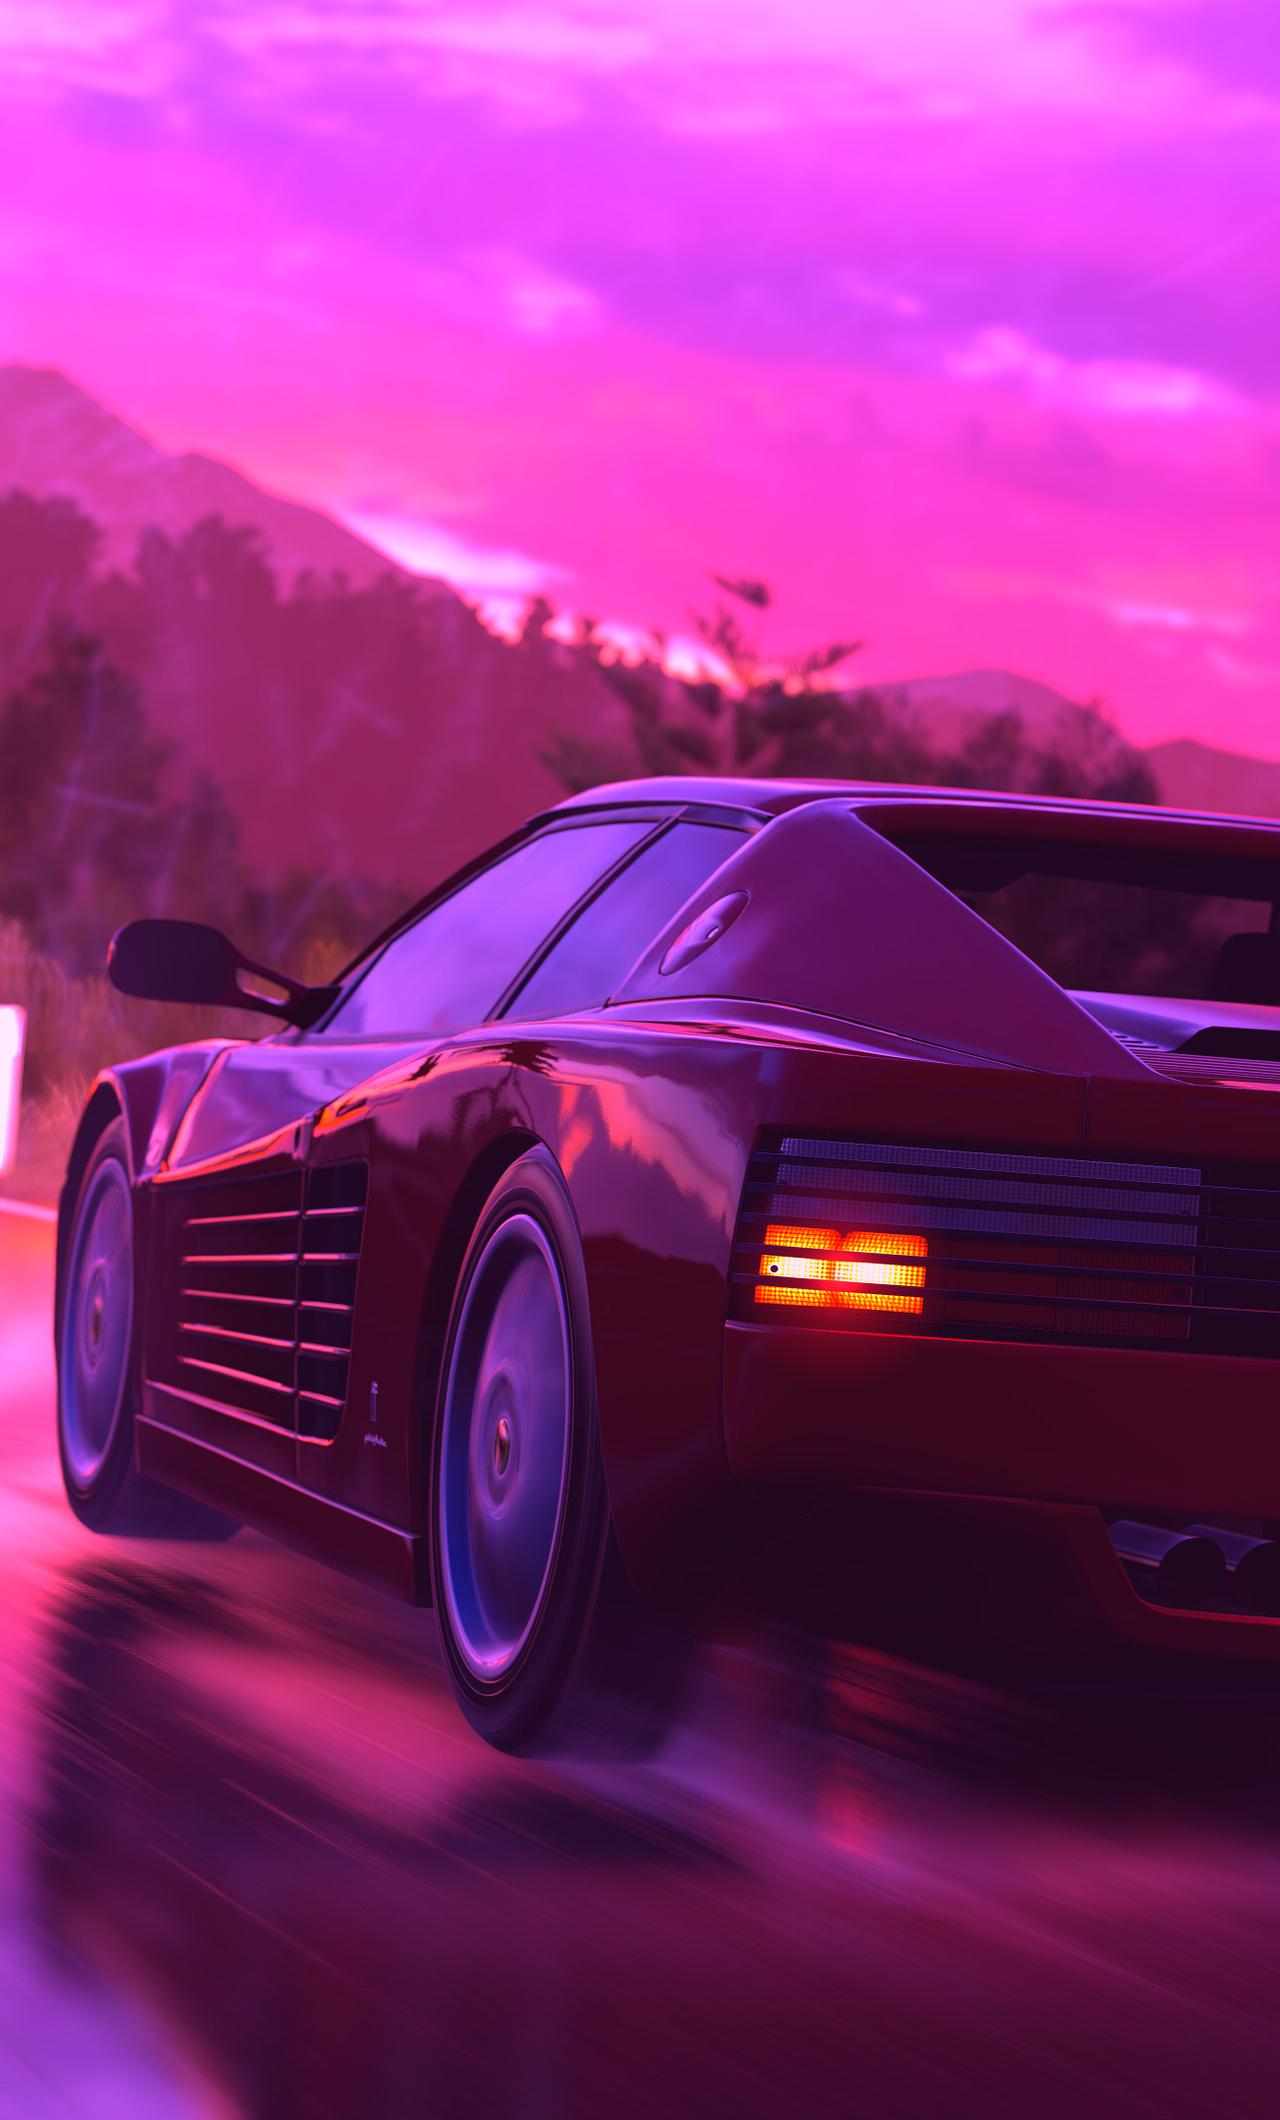 1280x2120 Ferrari Sports Car Retrowave Art 4k Iphone 6 Hd 4k Wallpapers Images Backgrounds 35 Quotes